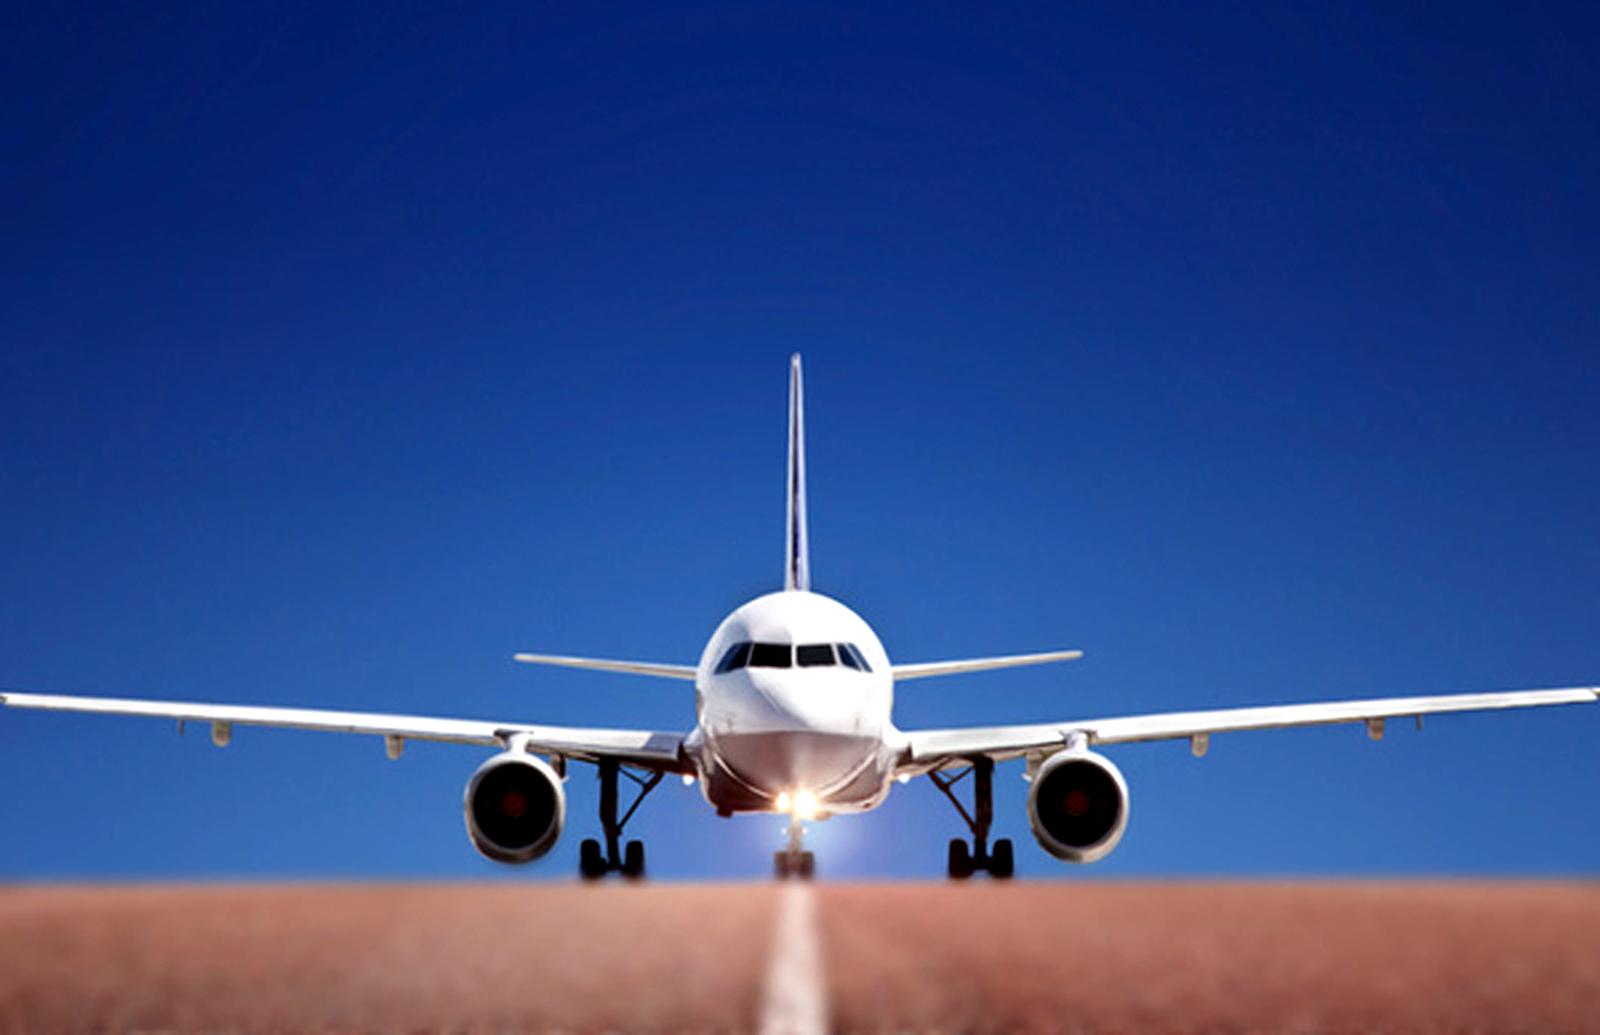 Airplane Khoirulpage